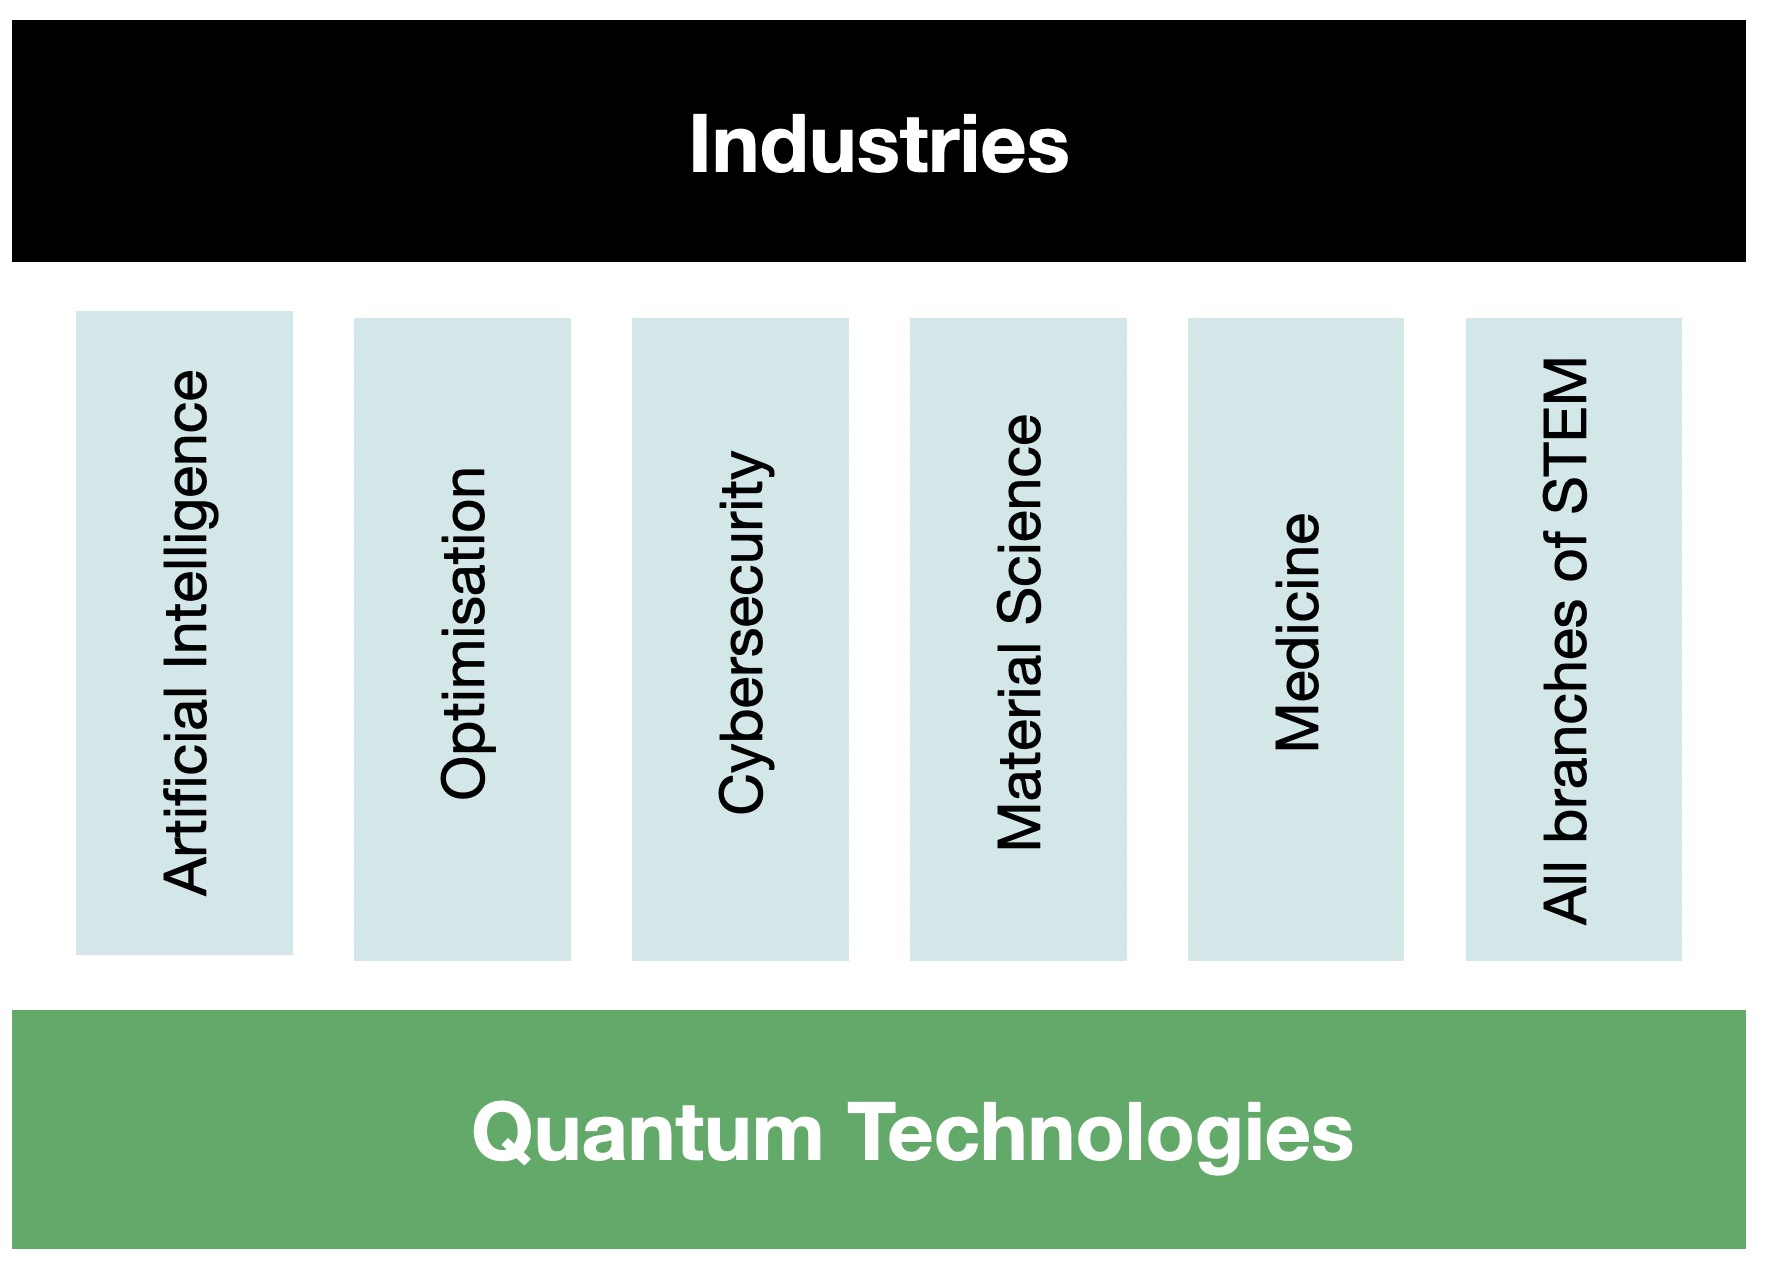 Quantum technologies as a foundation of STEM